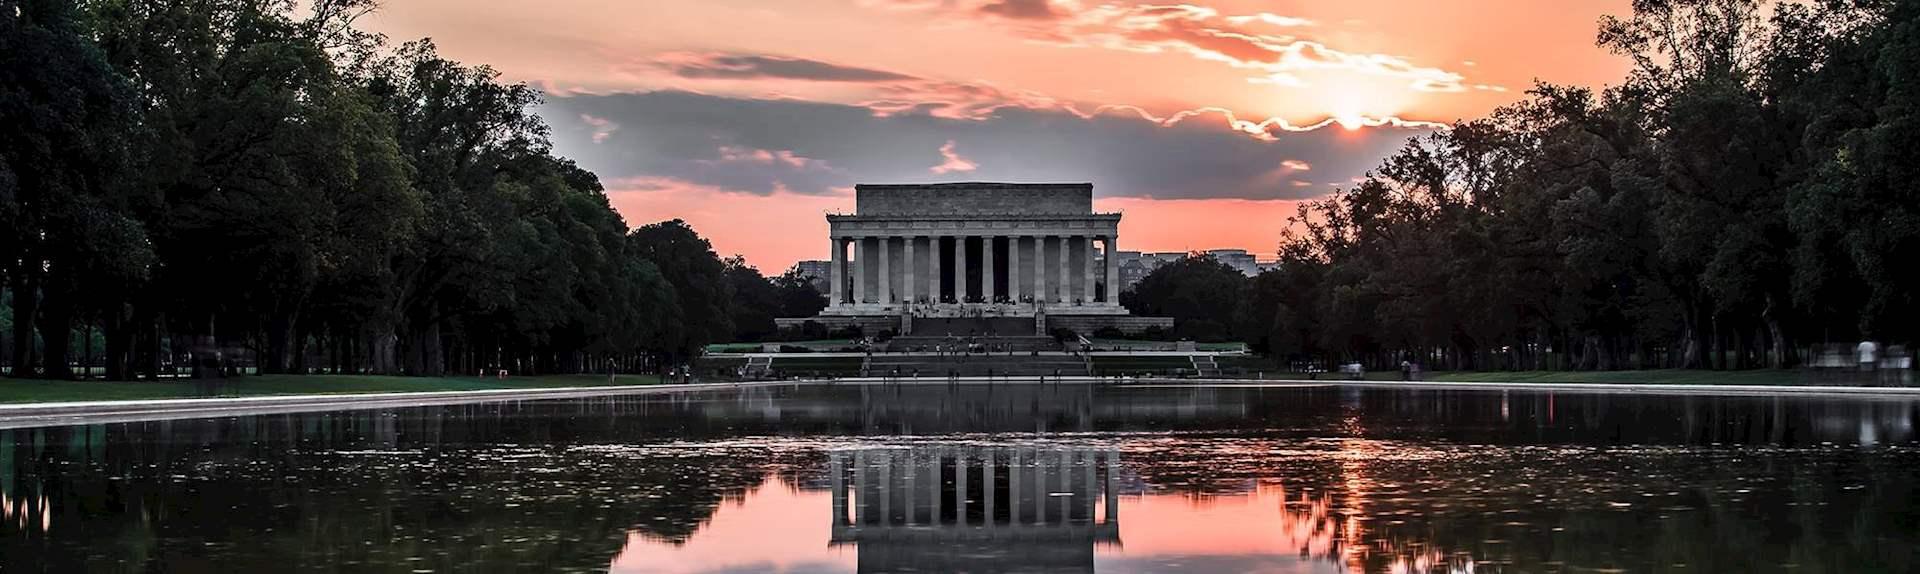 Explore in Washington, District of Columbia